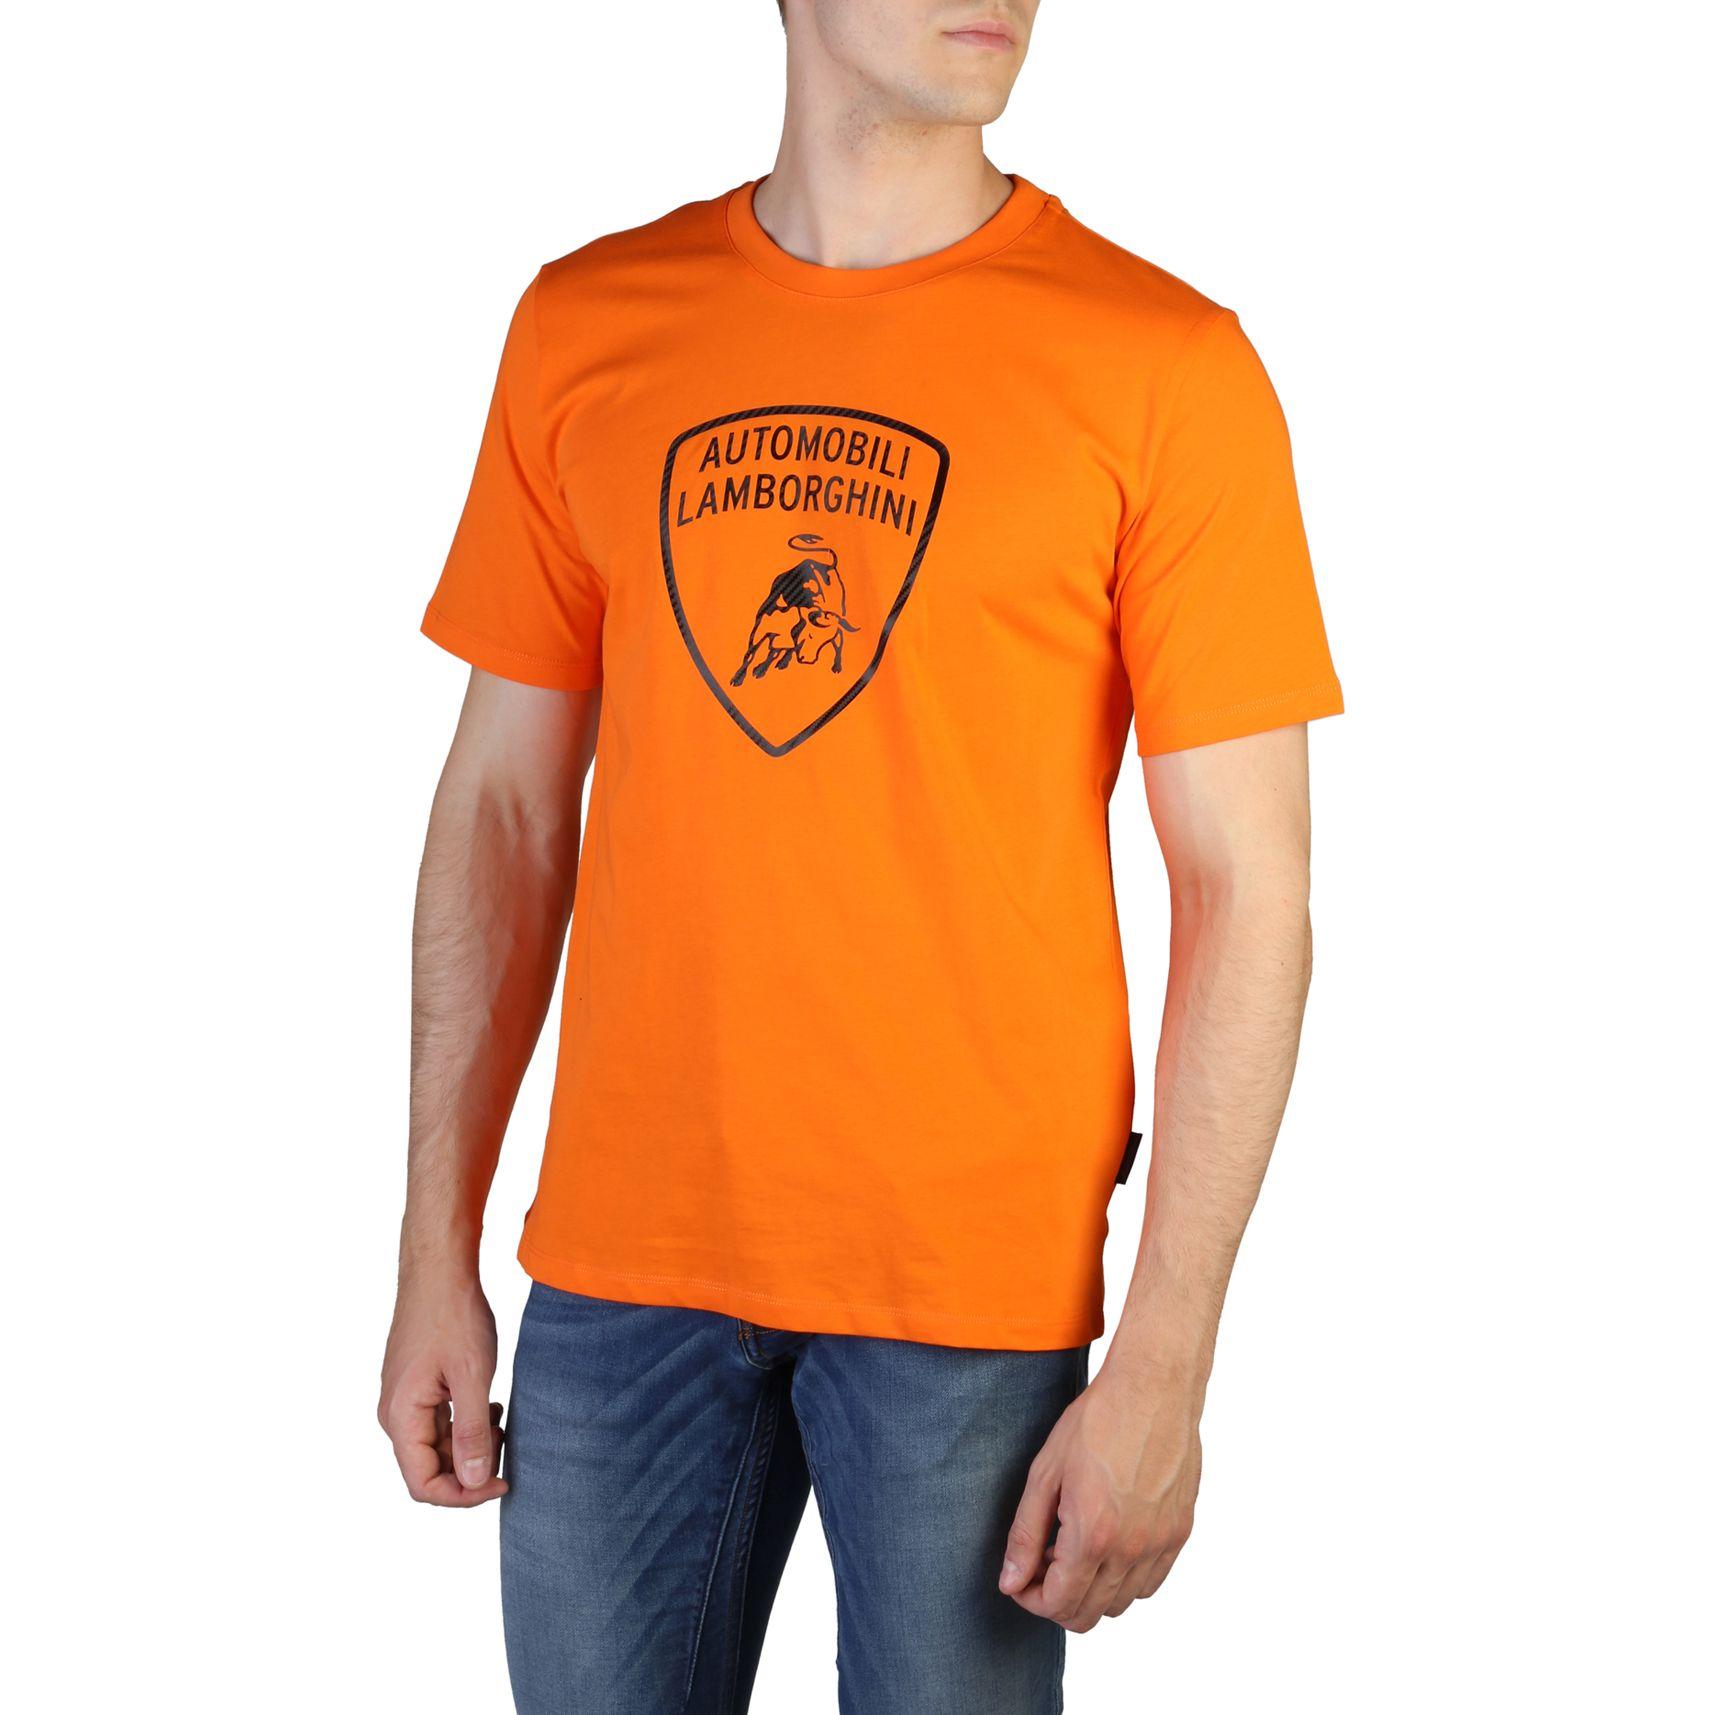 Automobili Lamborghini – B3XVB7TA – Oranje Designeritems.nl